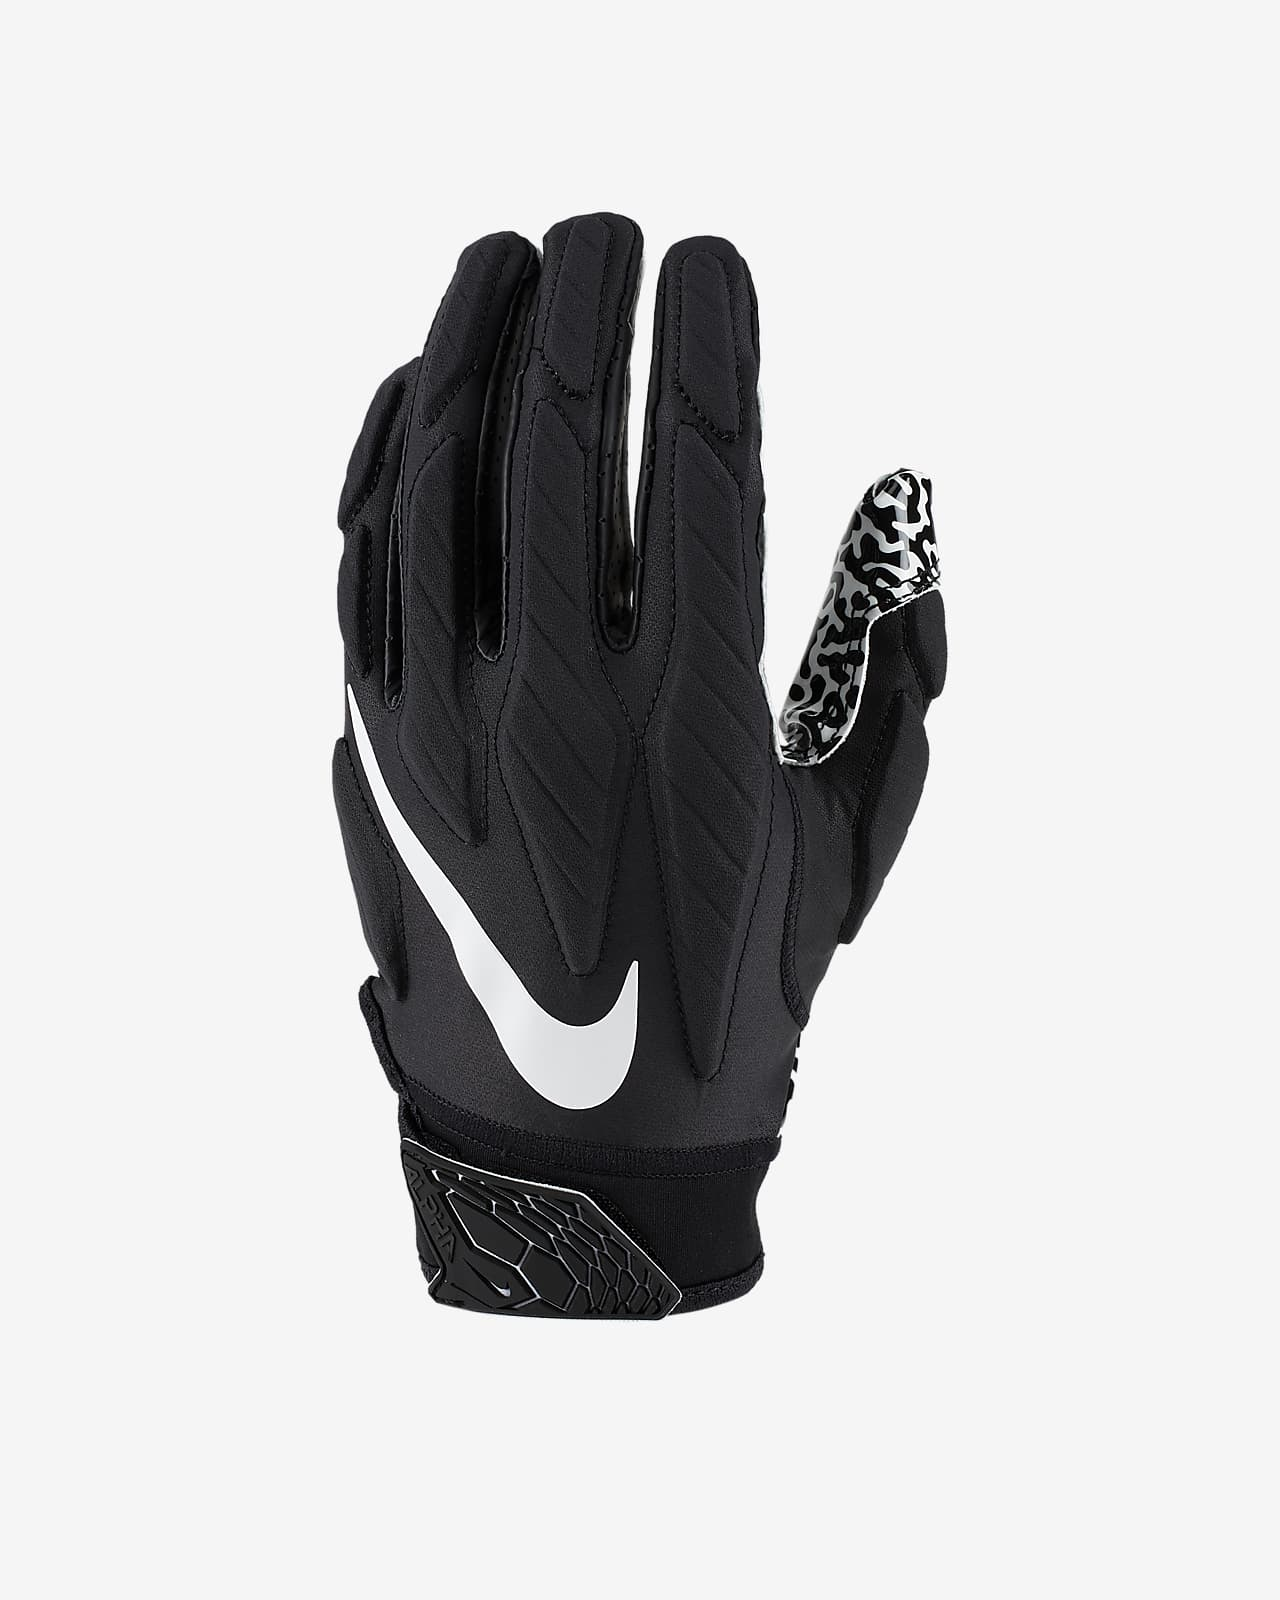 Enojado Consejos Telégrafo  Nike Superbad 5.0 Football Gloves. Nike.com